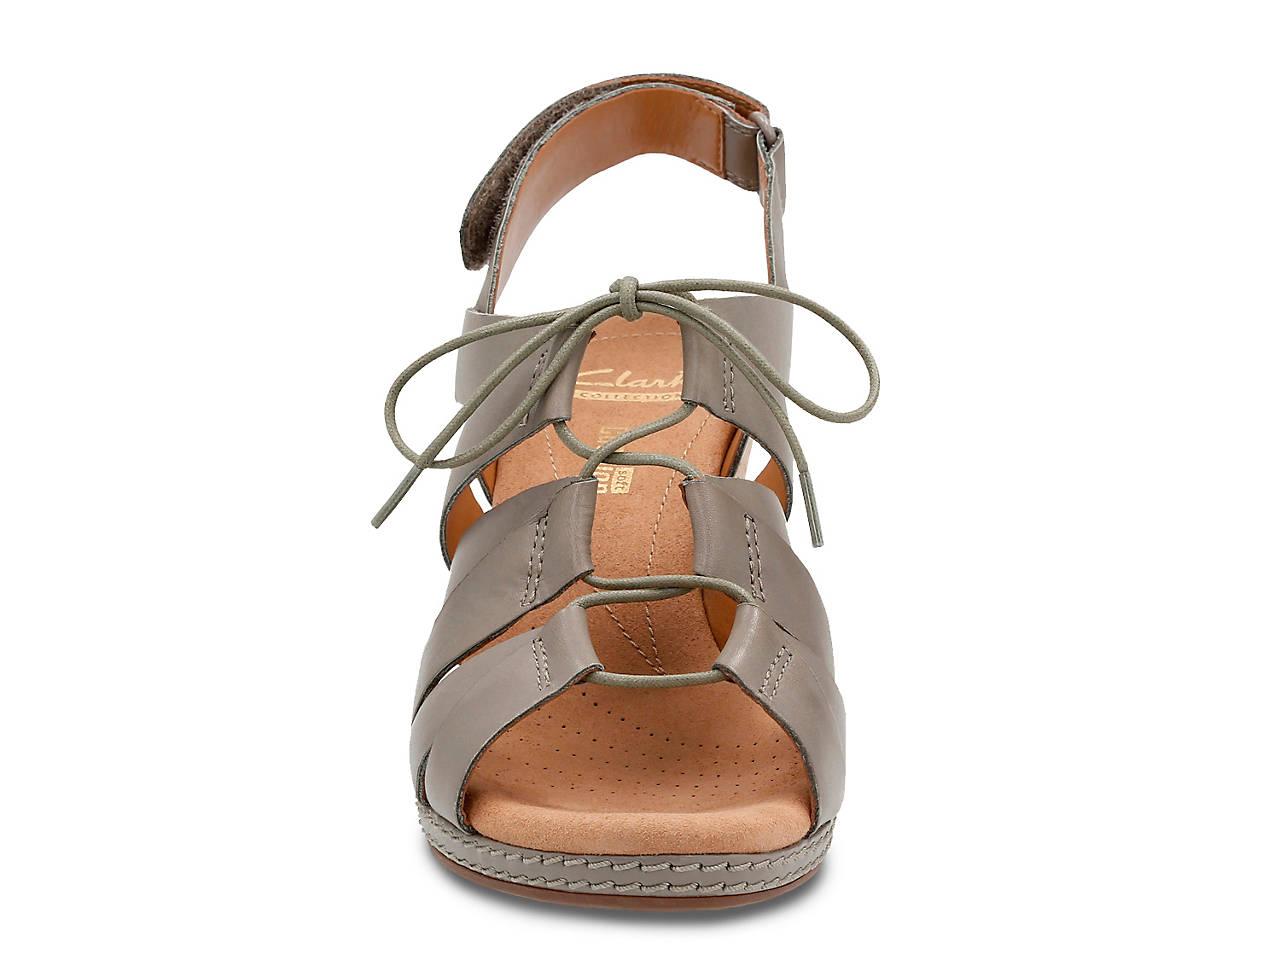 3cca300b9f80 Clarks Helio Mindin Wedge Sandal Women s Shoes